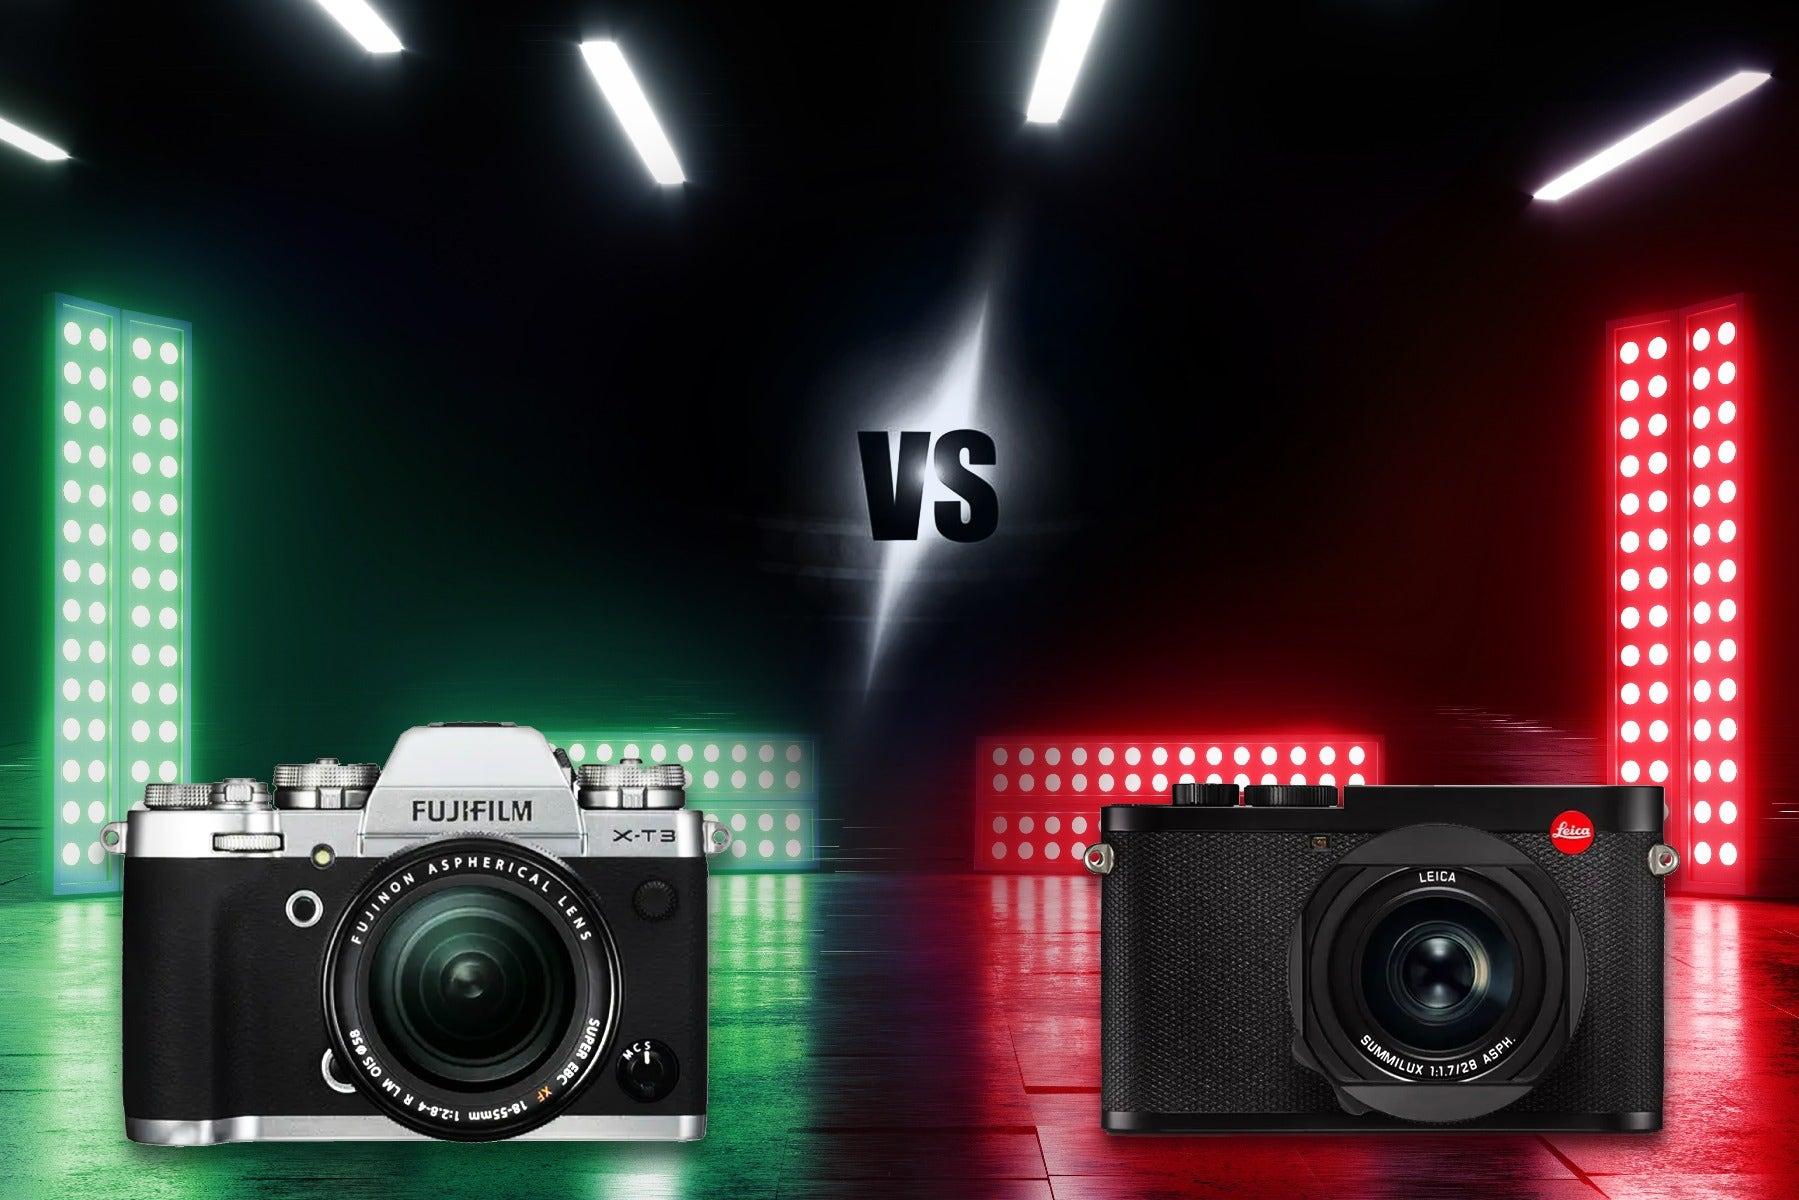 Fujifilm vs. Leica